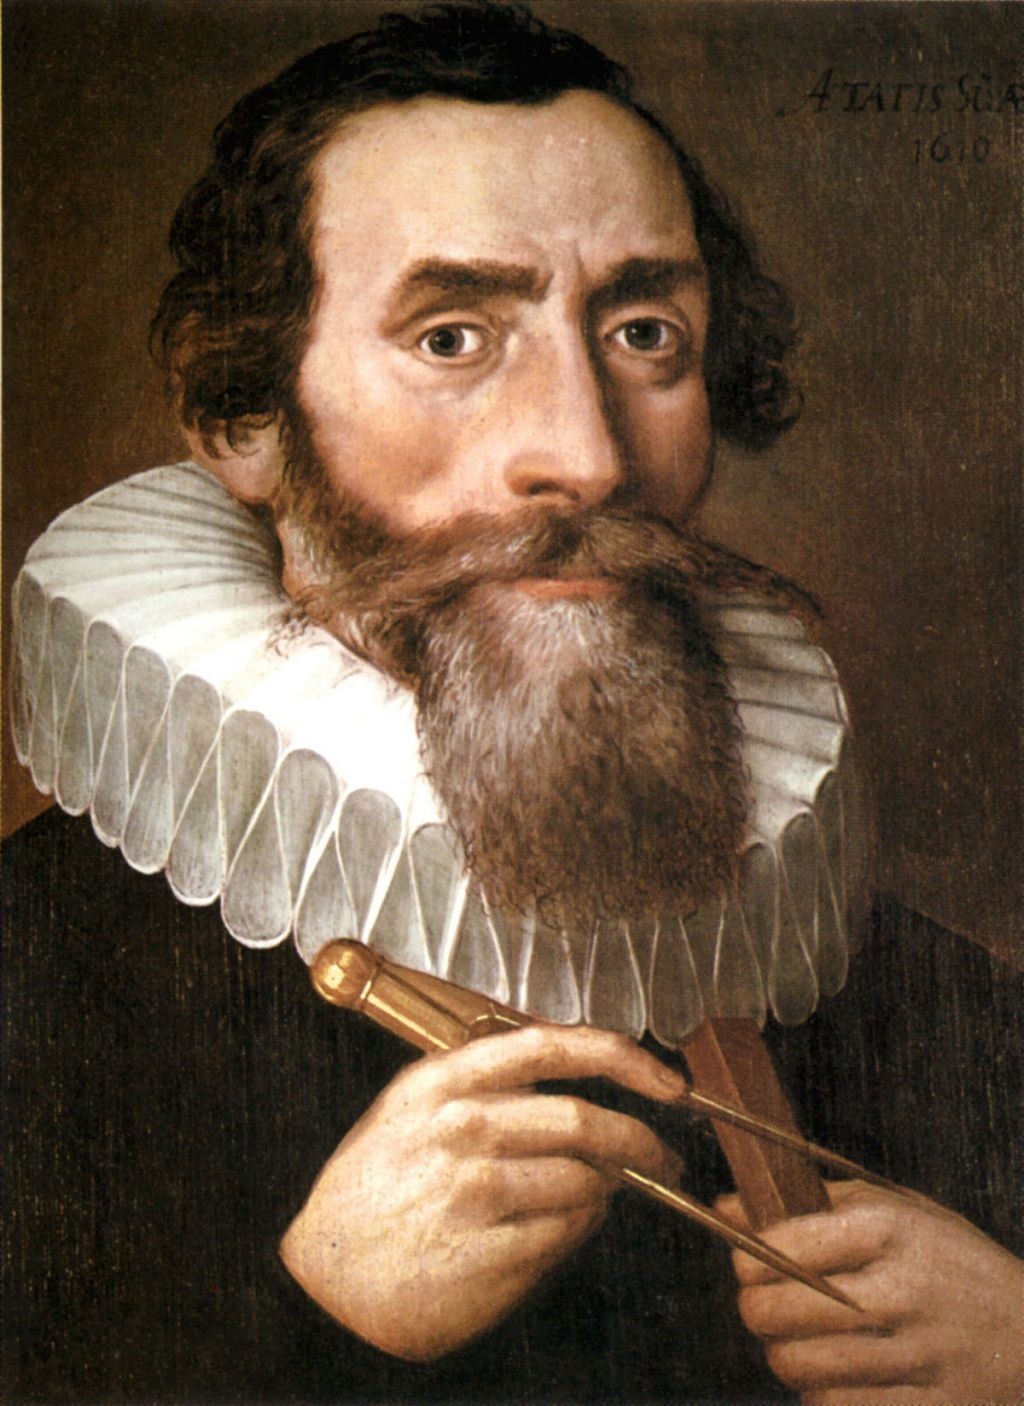 Биография Иоганна Кеплера